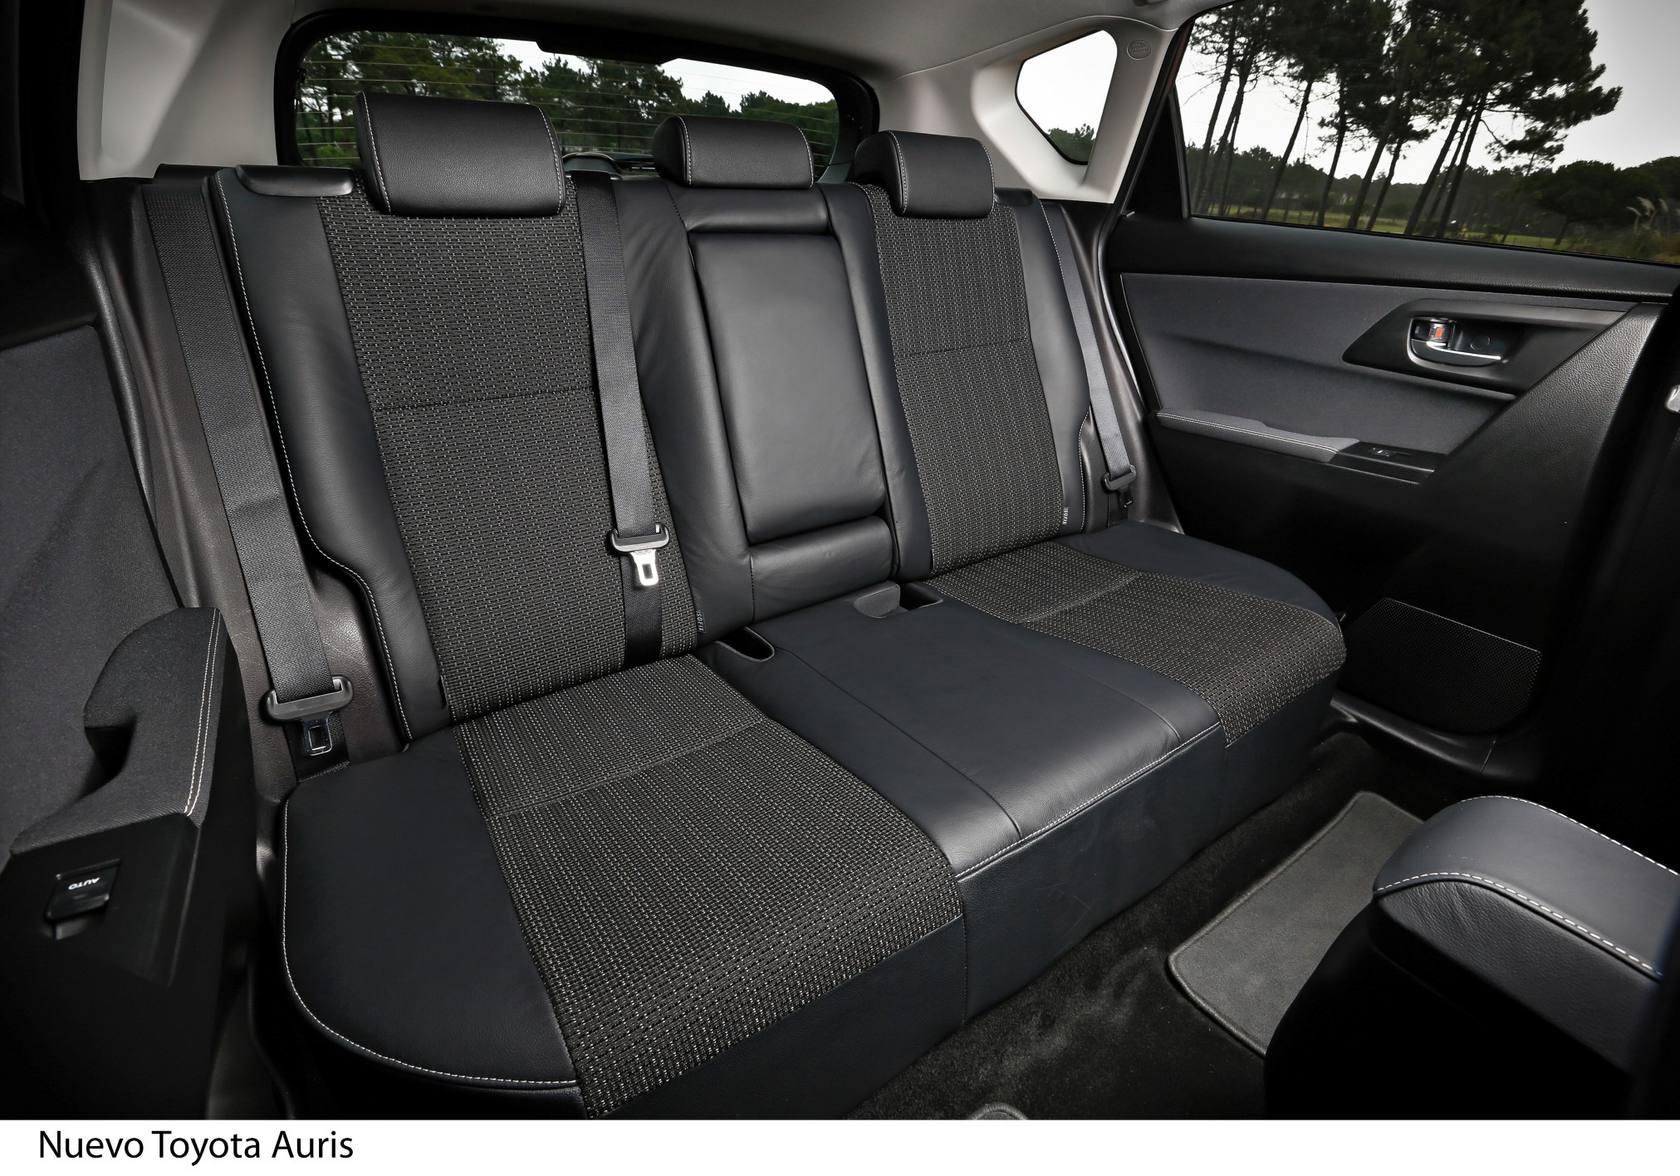 Nuevo Toyota Auris